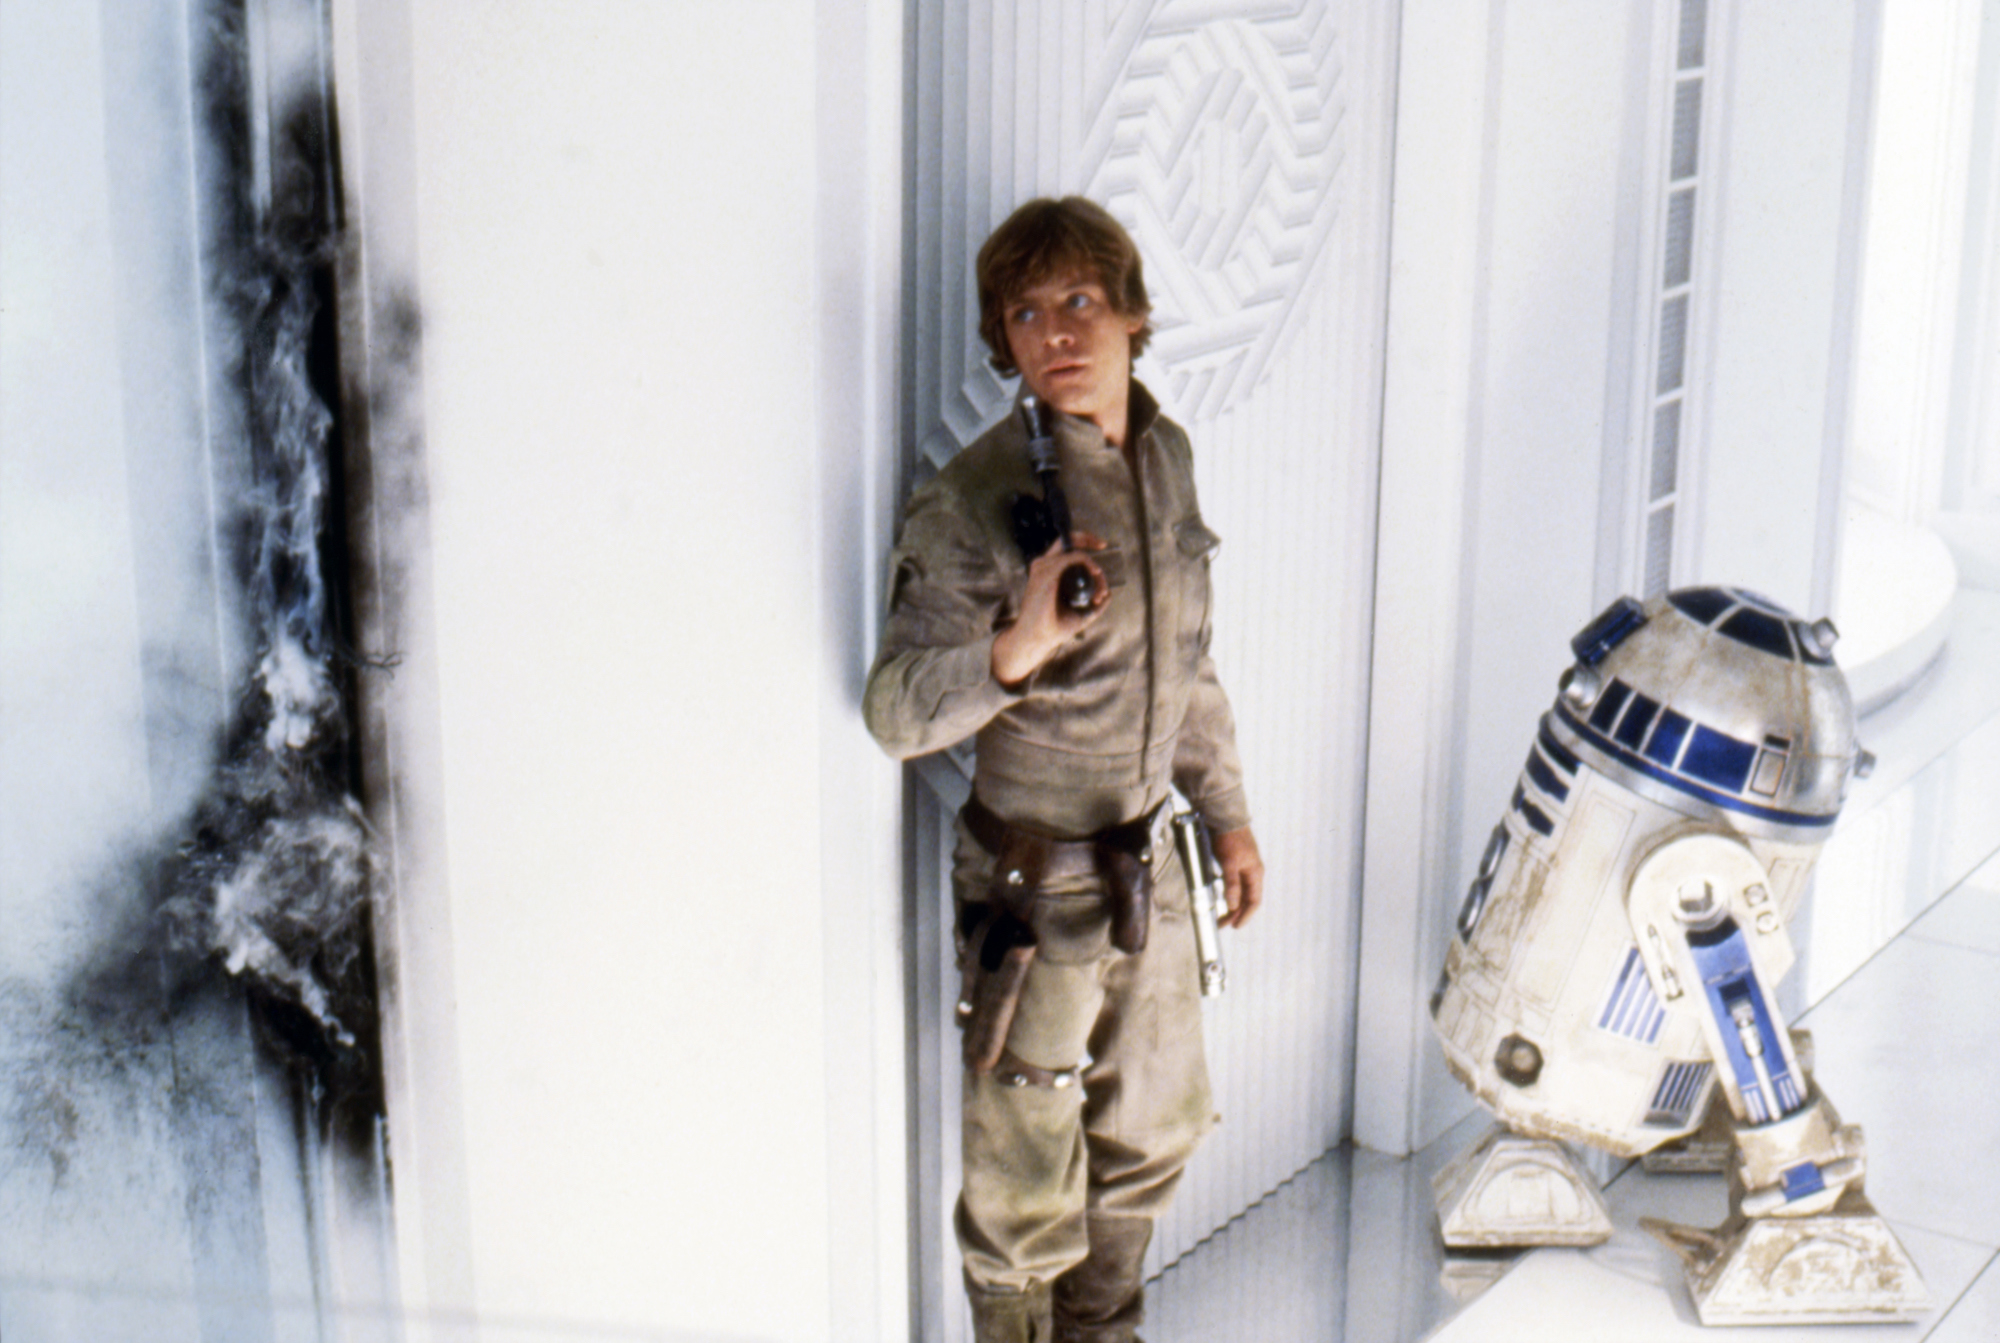 Mark Hamill (Luke Skywalker) and Kenny Baker (R2-D2) on the set of 'Star Wars: Episode V - The Empire Strikes Back' directed by Irvin Kershner